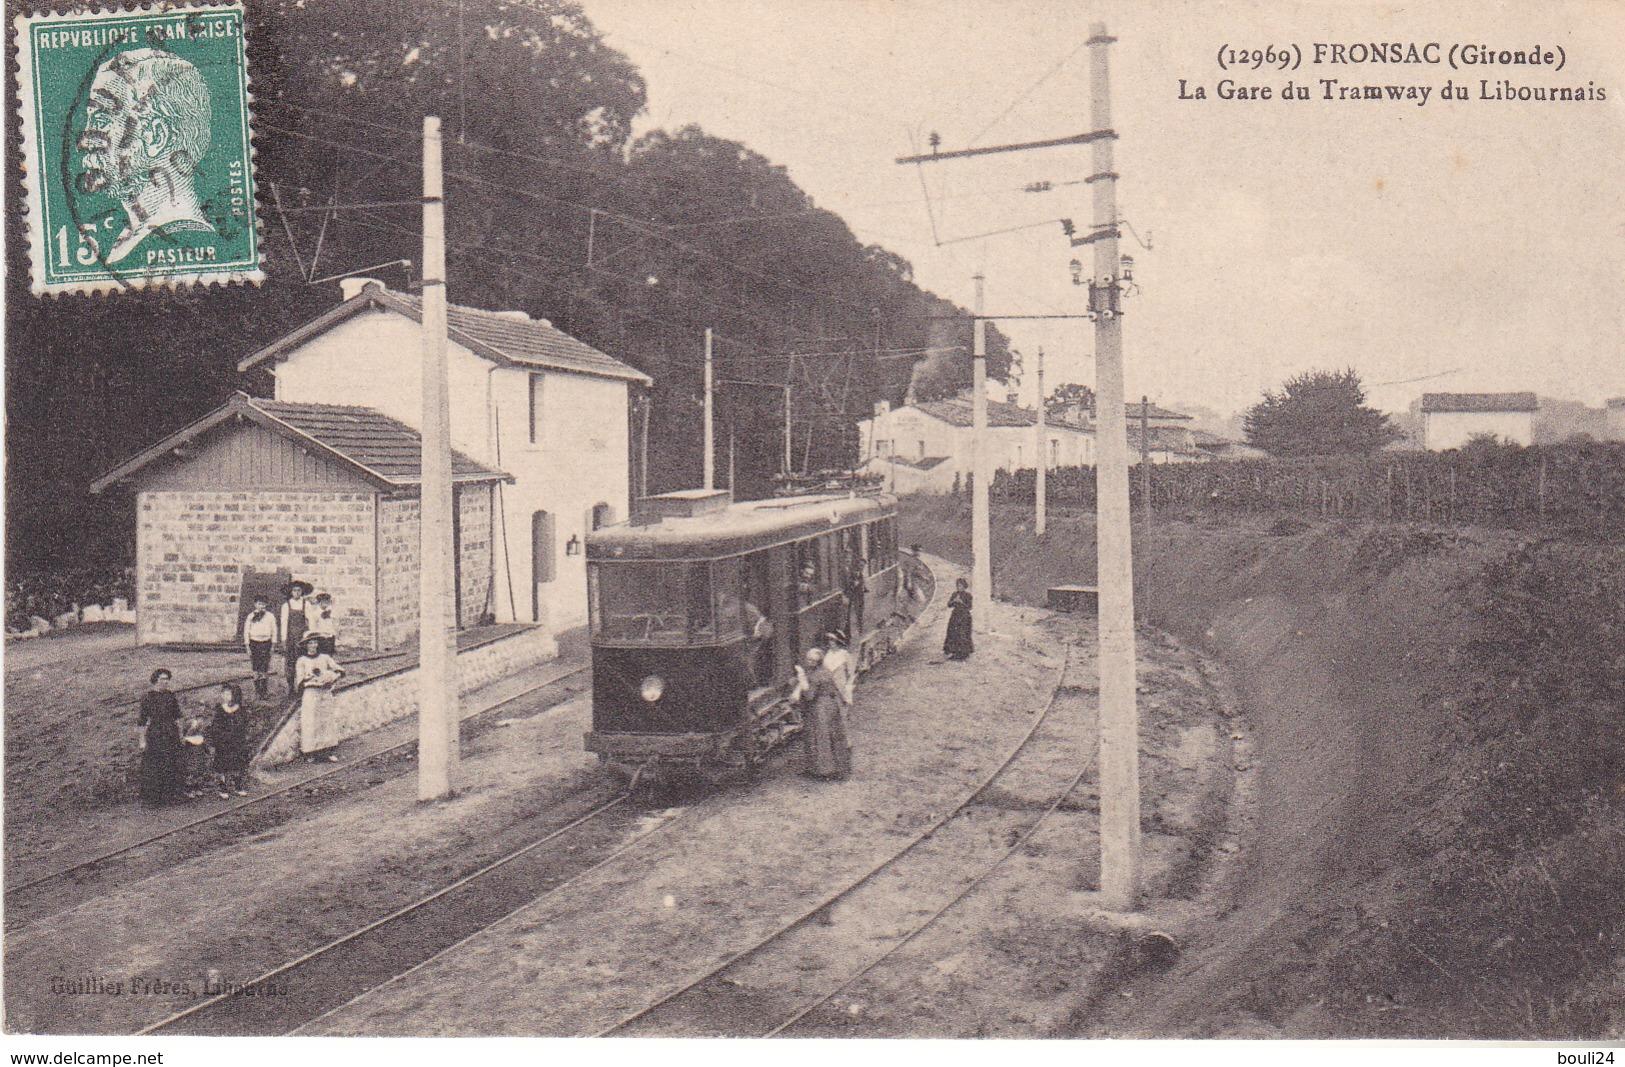 AVIT18- FRONSAC  EN GIRONDE LA GARE DU TRAMWAY  DU LIBOURNAIS     CPA  CIRCULEE - France